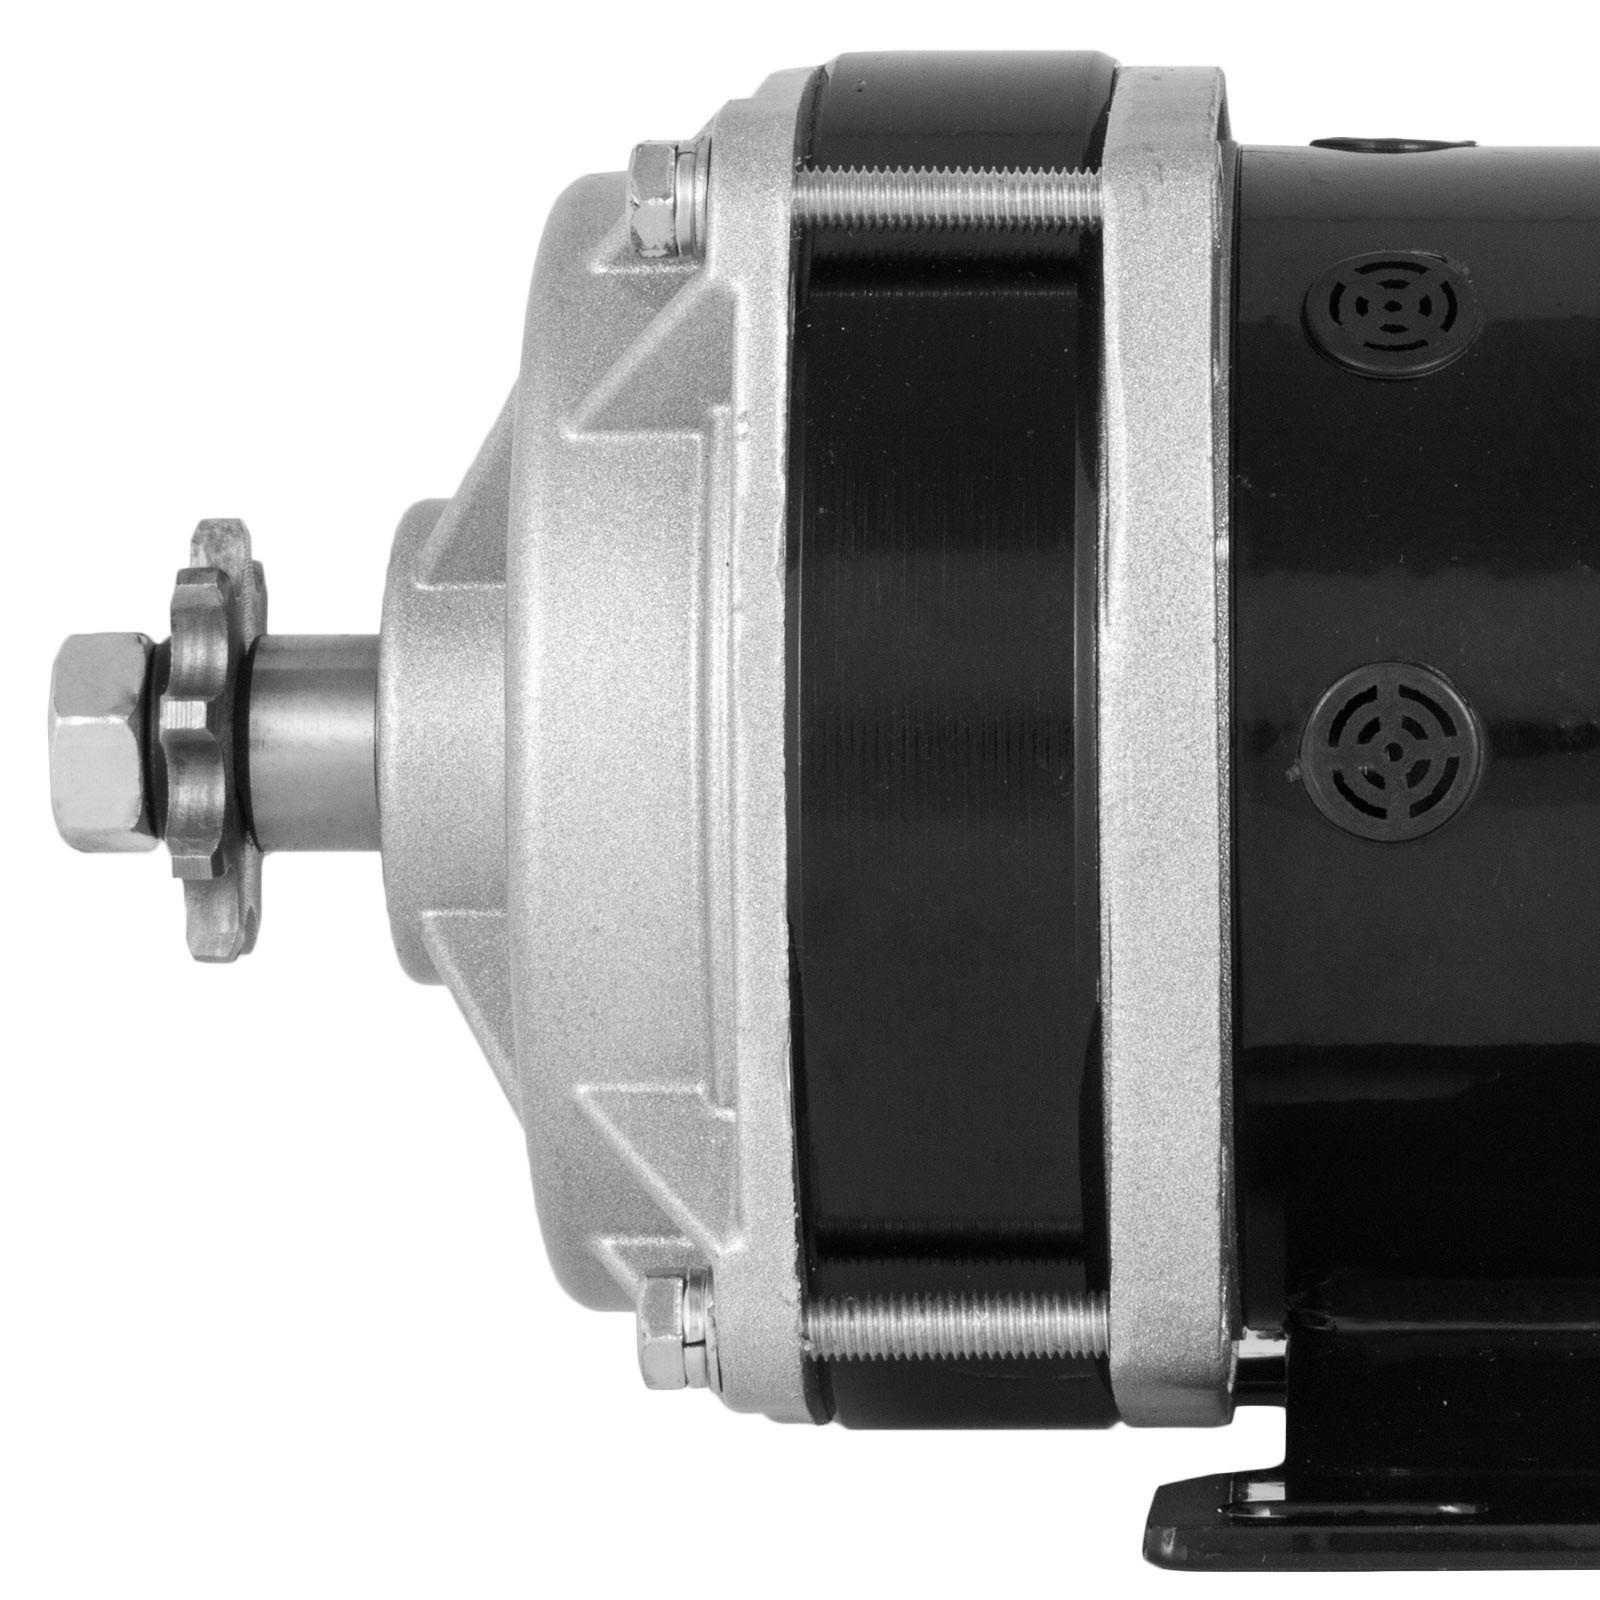 DC-electric-motor-12-60V-150W-2KW-for-scooter-bike-go-kart-minibike-e-ATV thumbnail 104